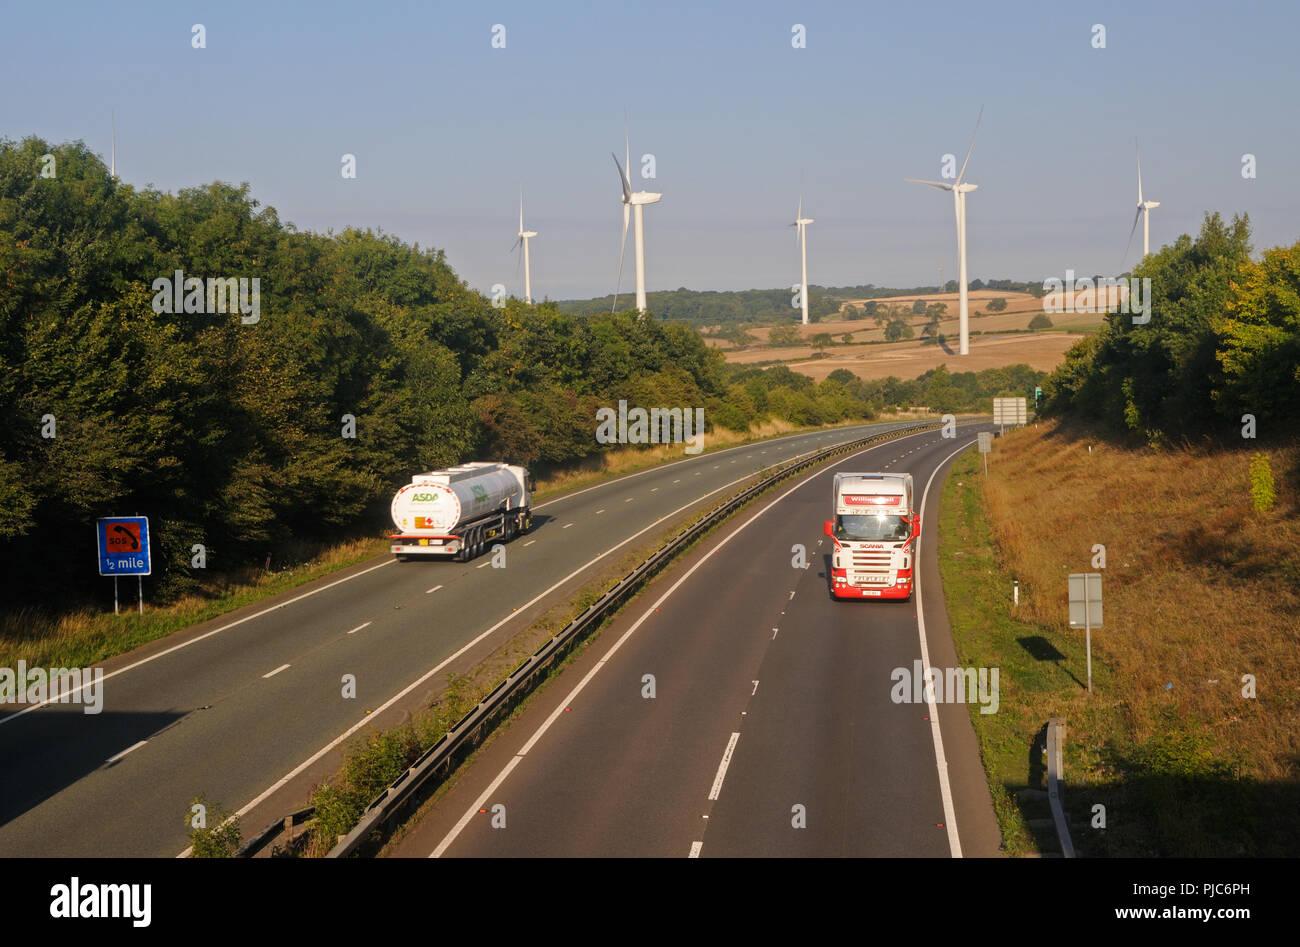 The A14 trunk road near Kelmarsh, Northamptonshire, England - Stock Image